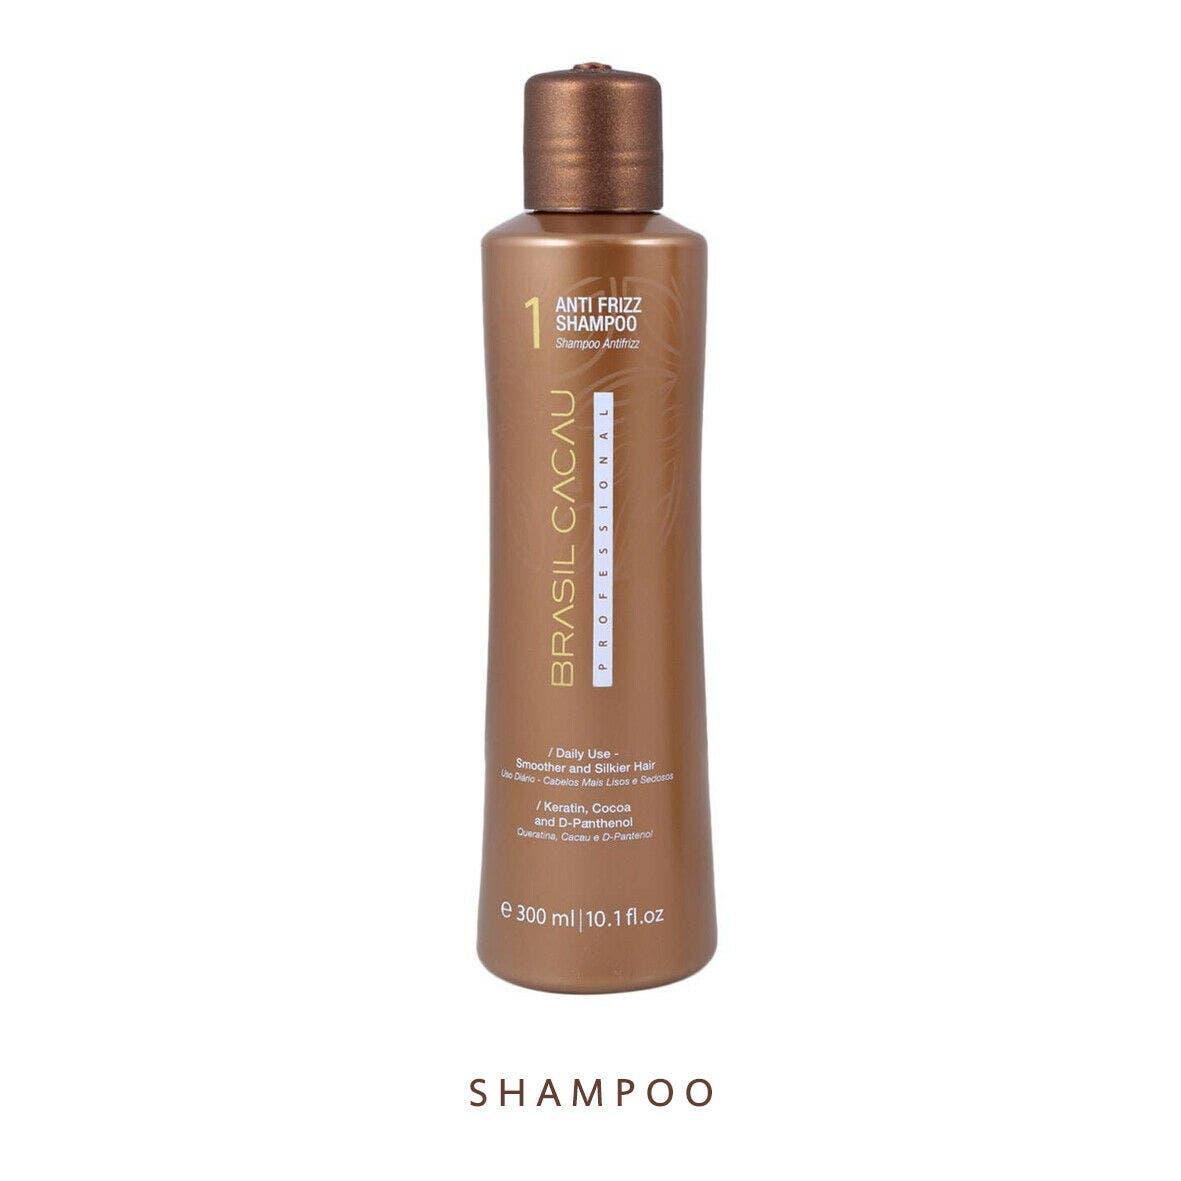 Brasil Cacau ANTI FRIZZ 300ml Shampoo For Damaged Hair